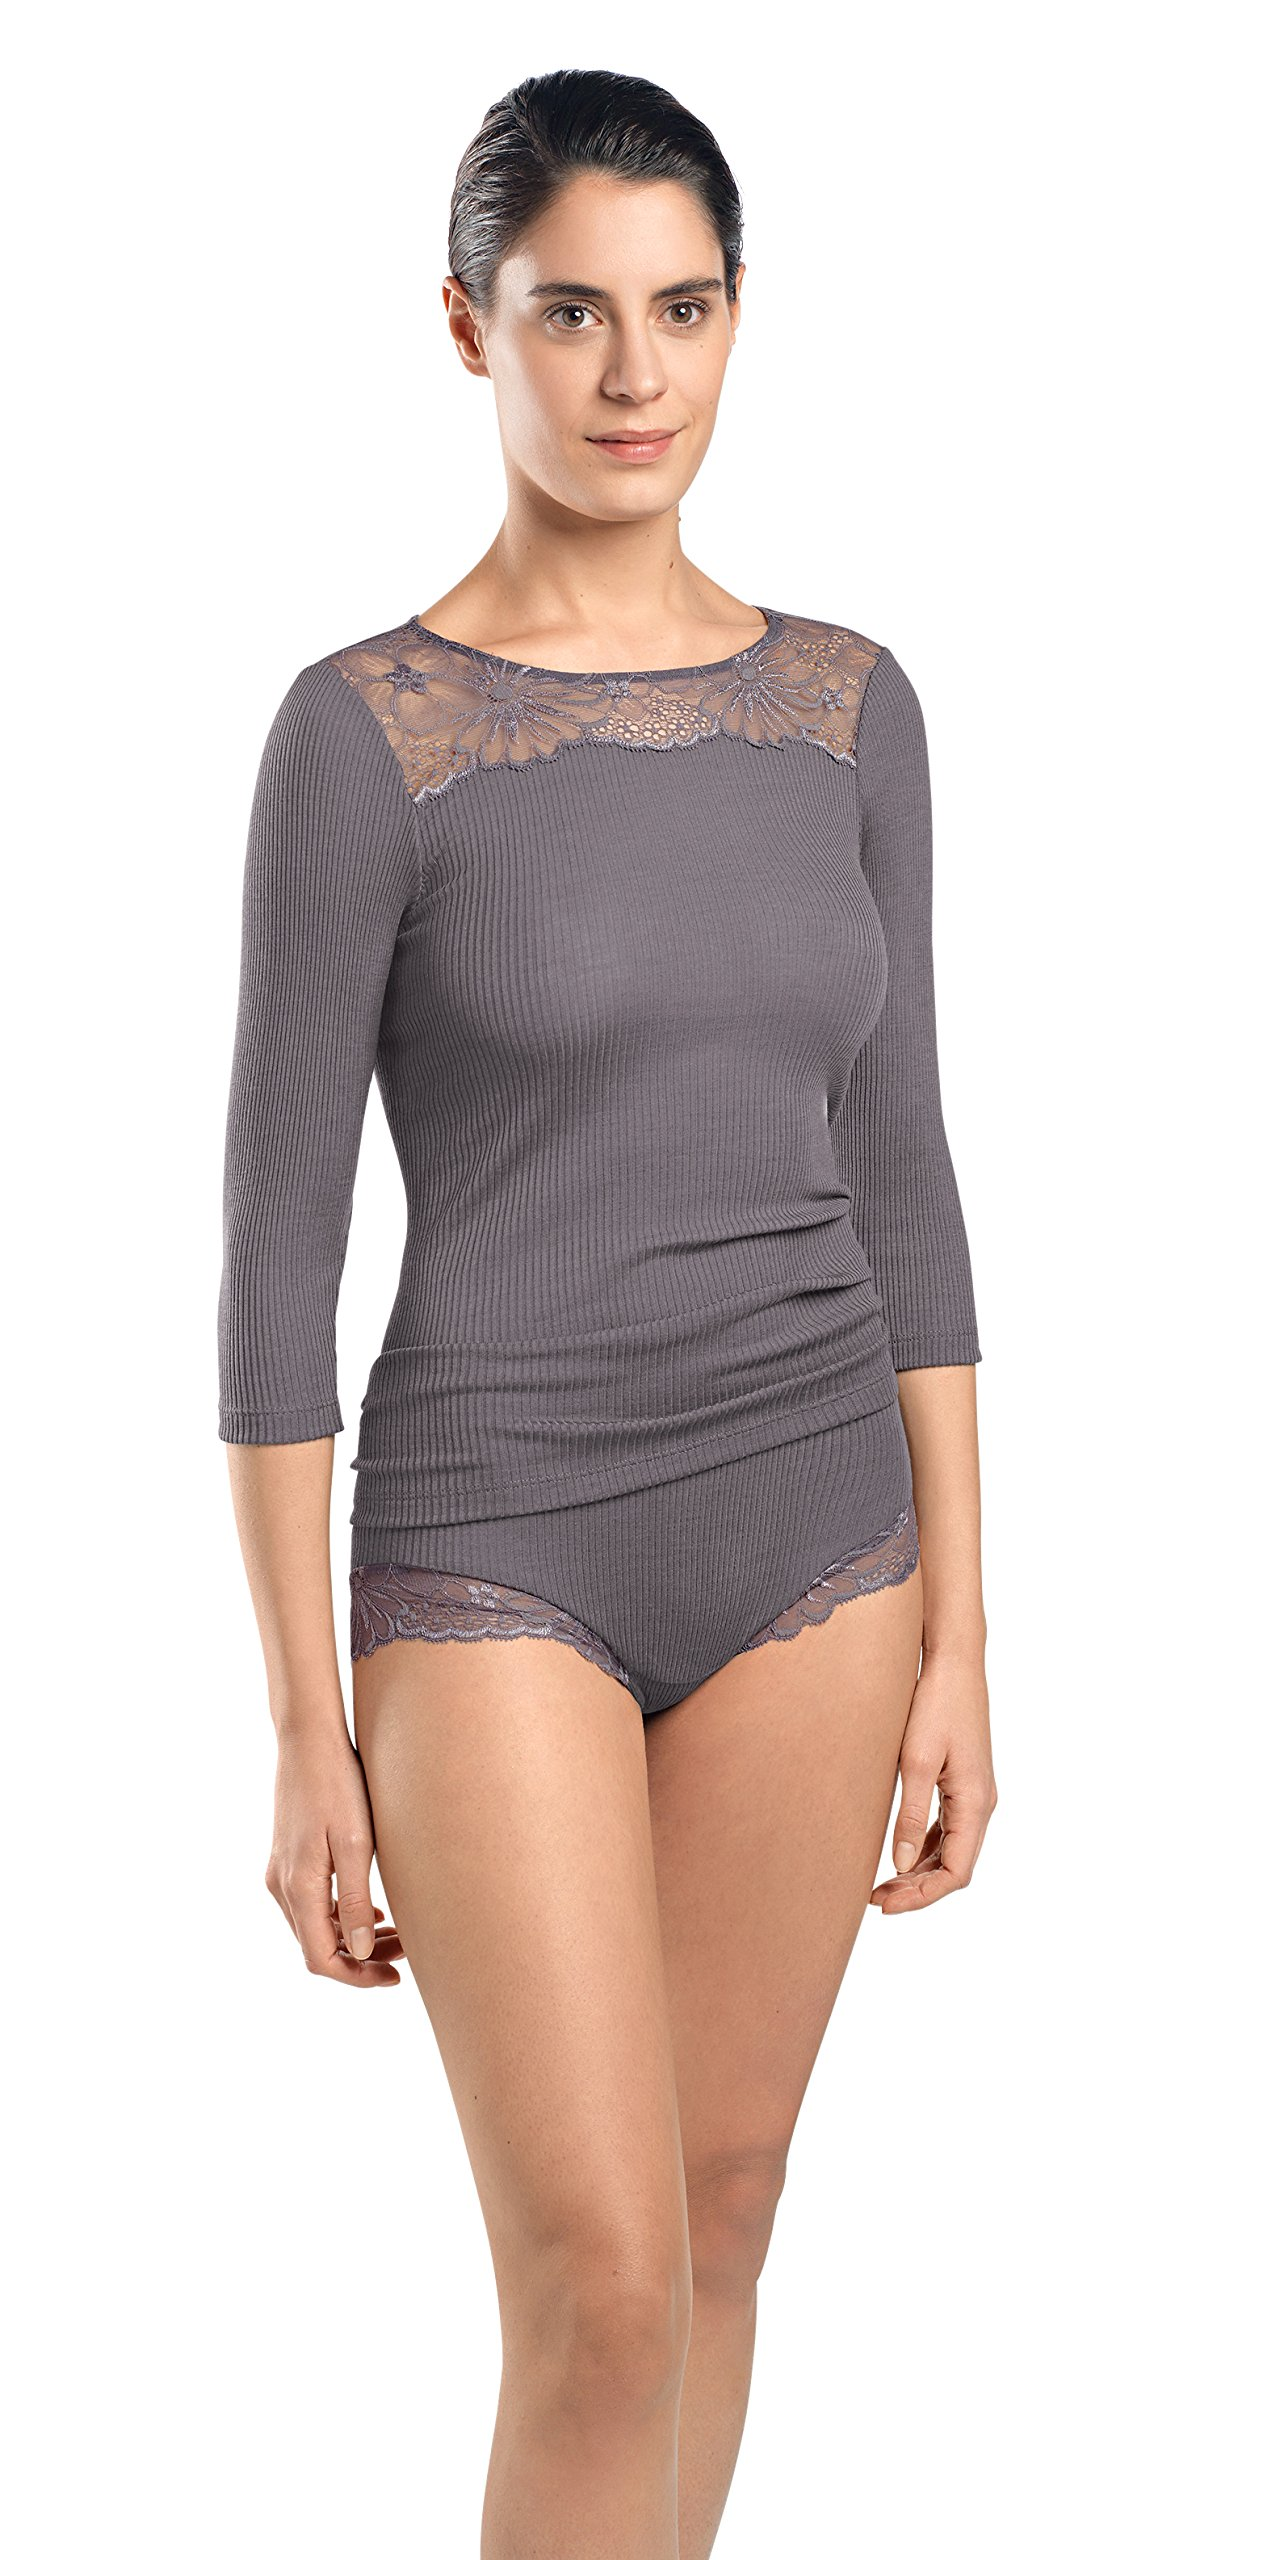 Hanro Women's Seraphina 3/4 Sleeve Shirt 72147, Warmgrey, Large